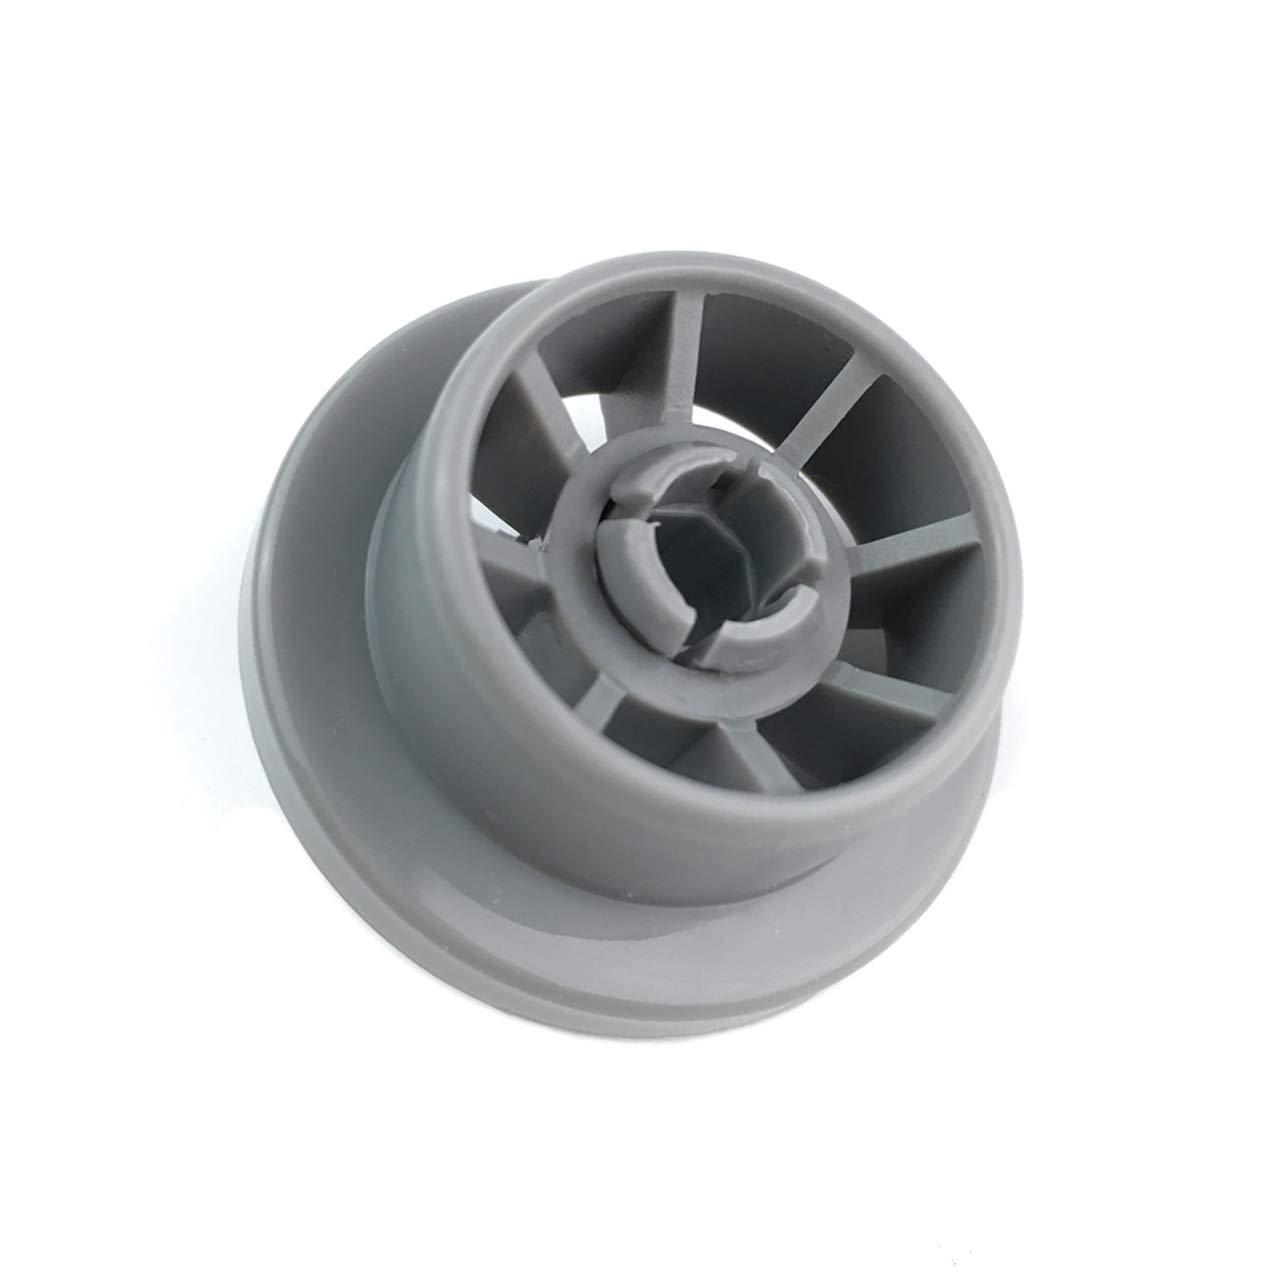 4 Pack Dishwasher Lower Basket Rail Roller Wheels for Bosch Neff & Siemens 165314 420198 AP2802428 PS3439123